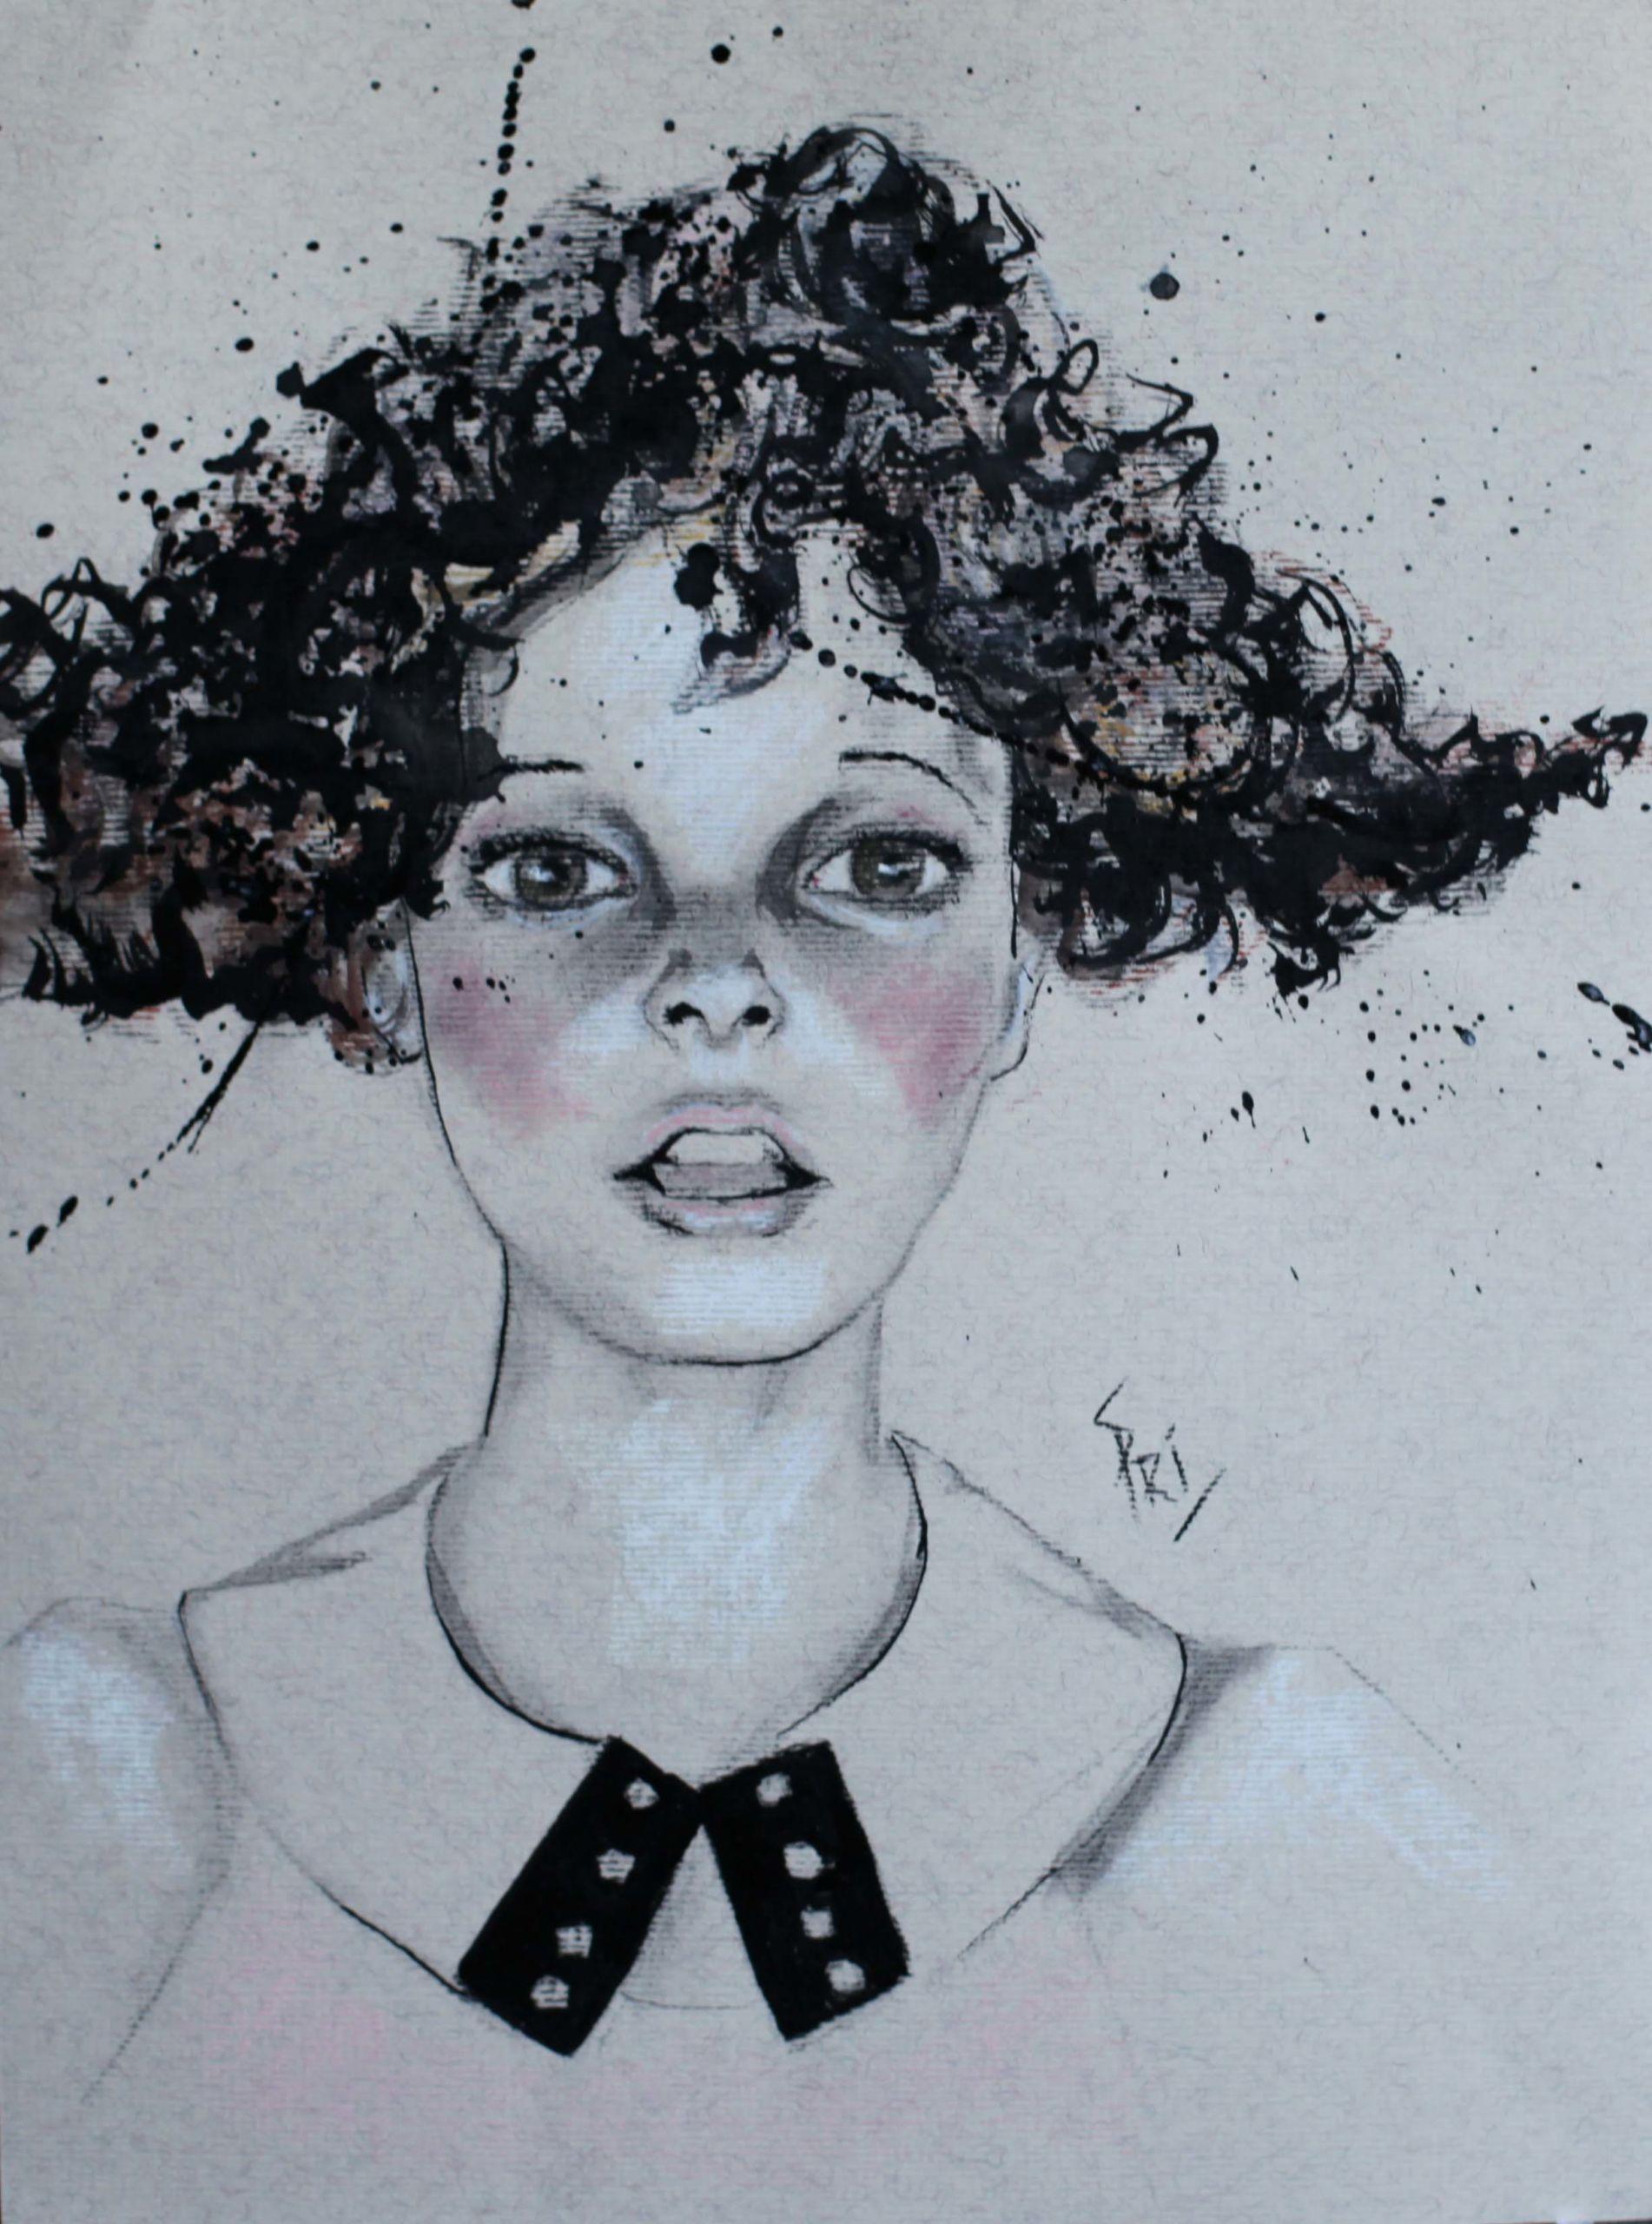 Dessin pastel par Priscilla Seiller